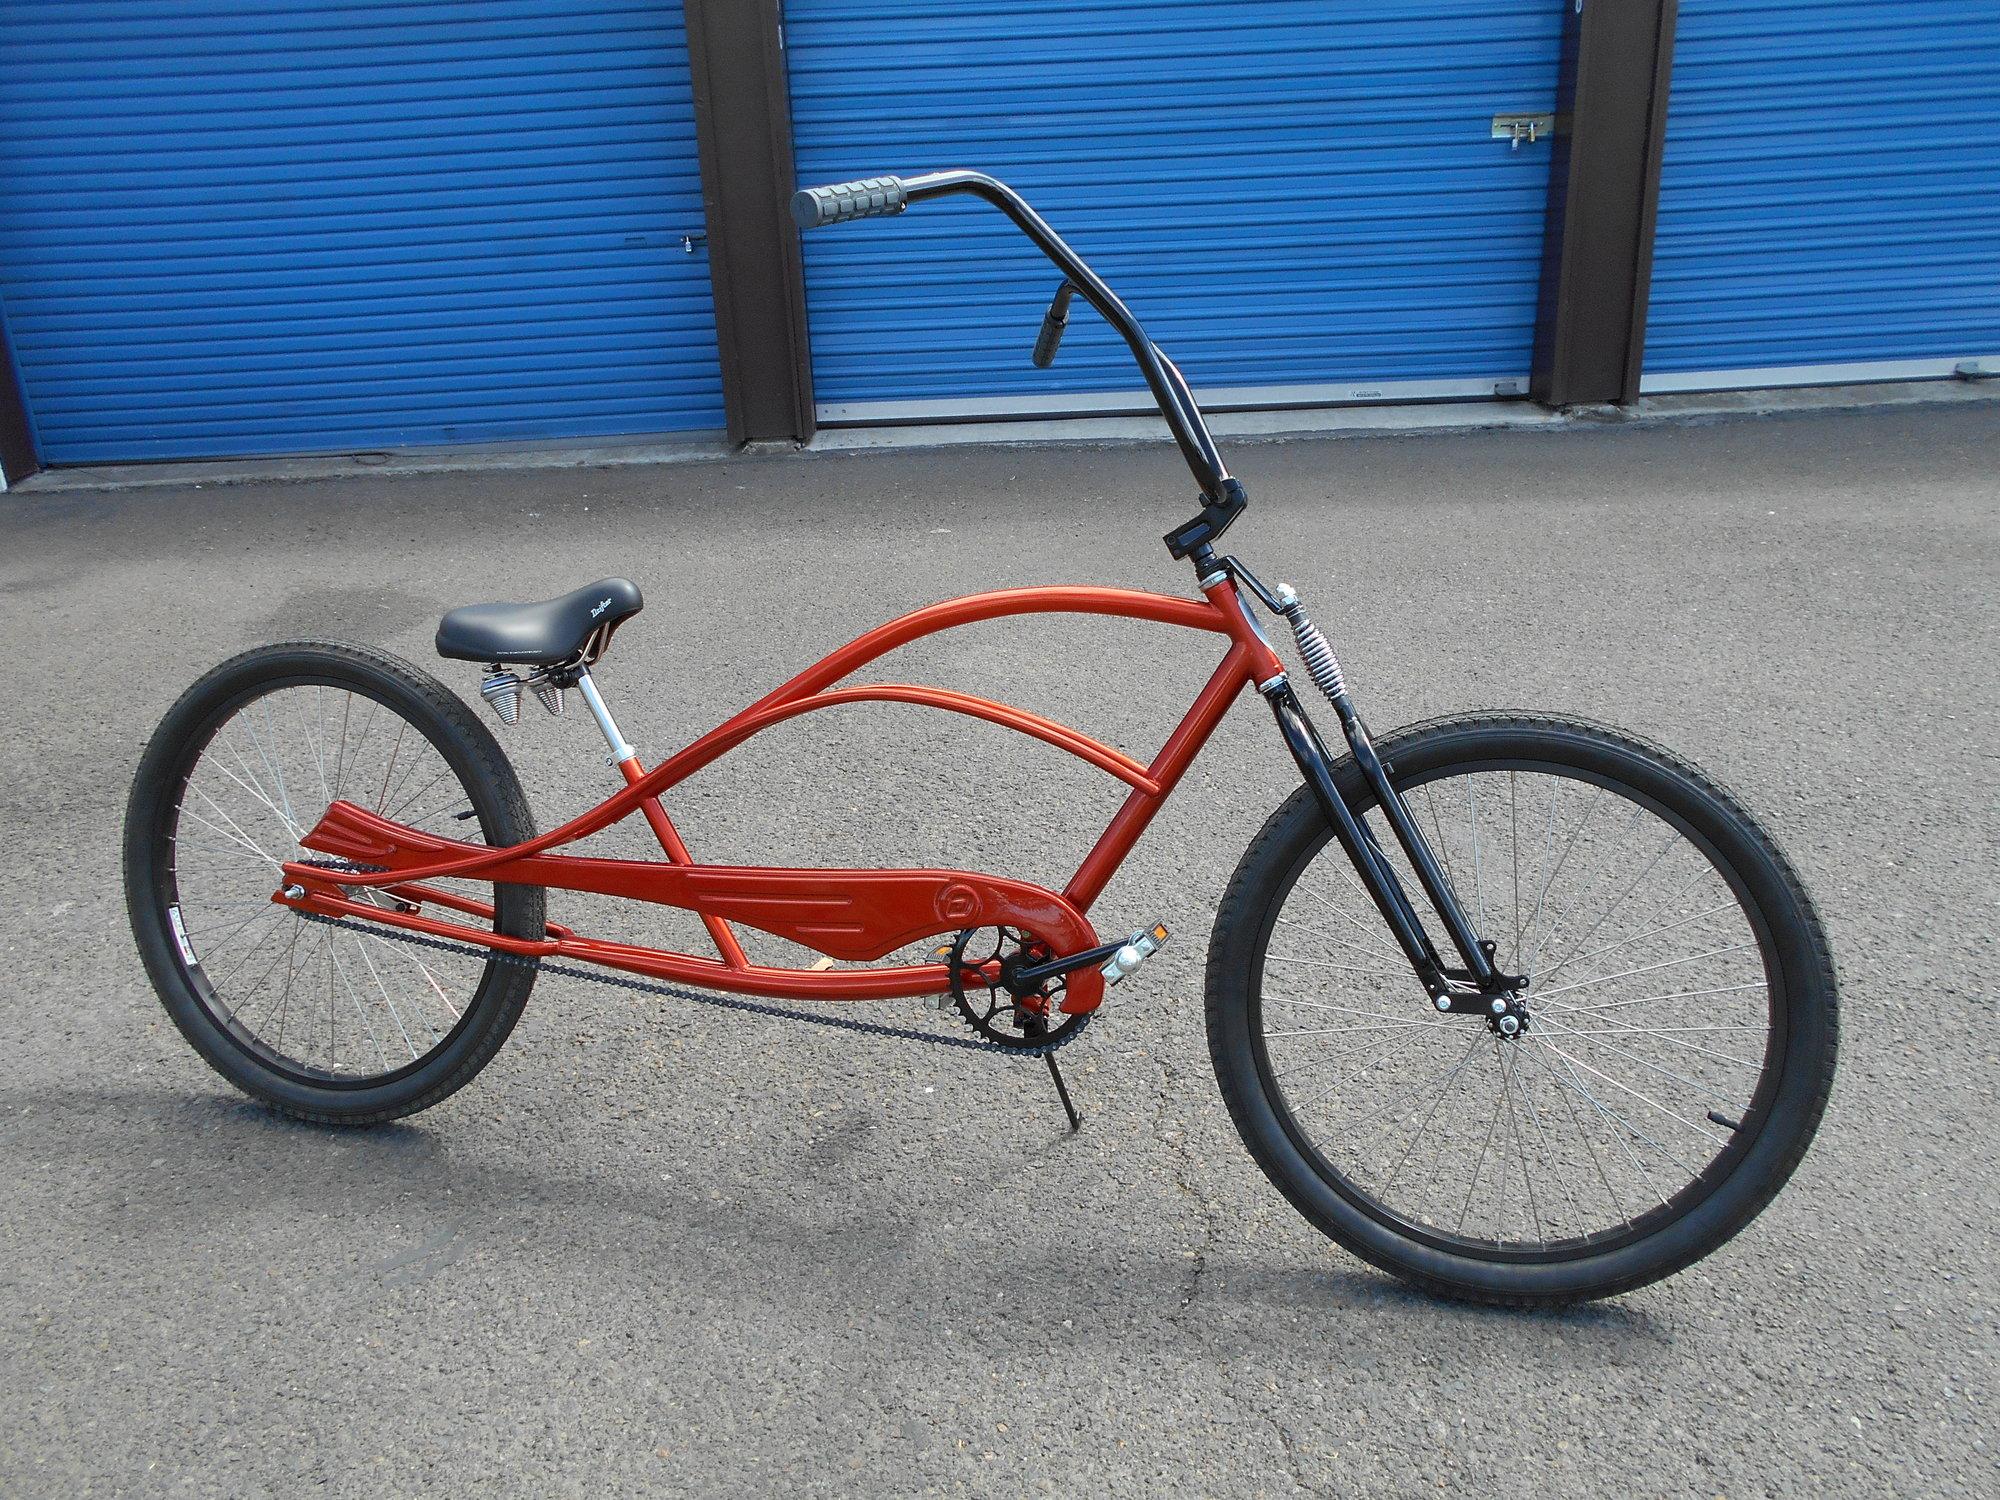 New to Dyno bikes - Page 2 - Bike Forums